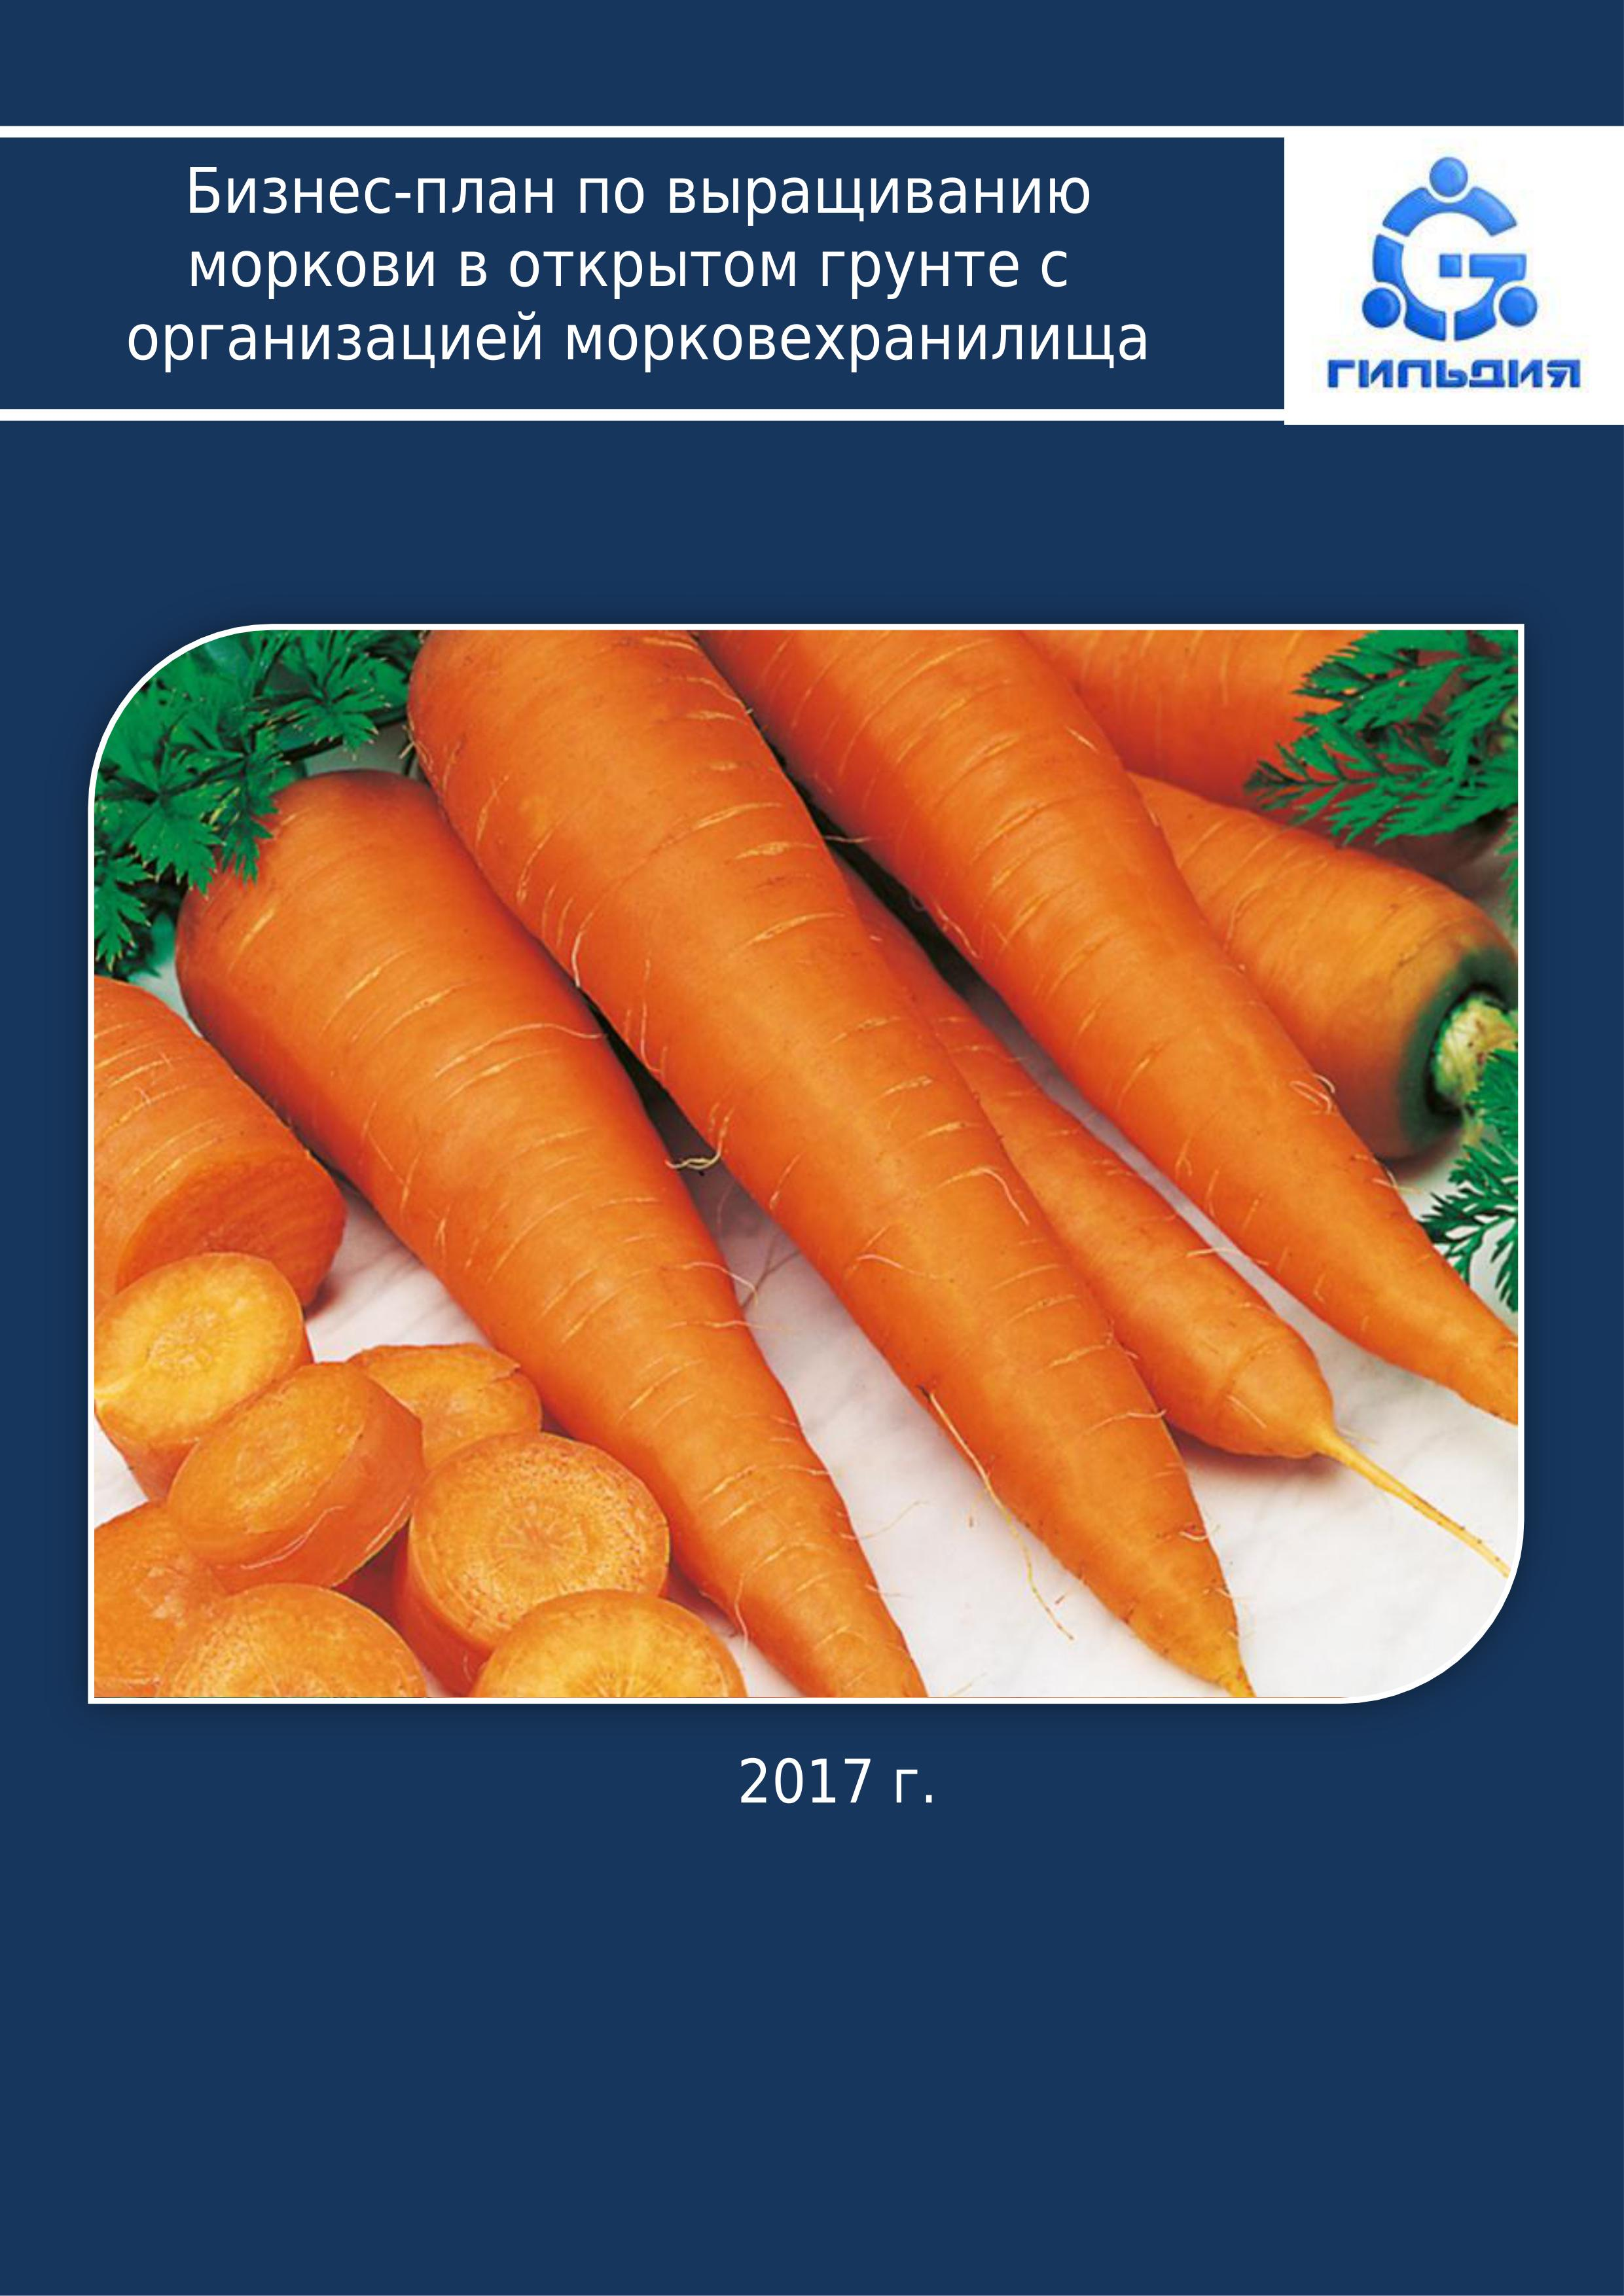 Бизнес на выращивании моркови 297